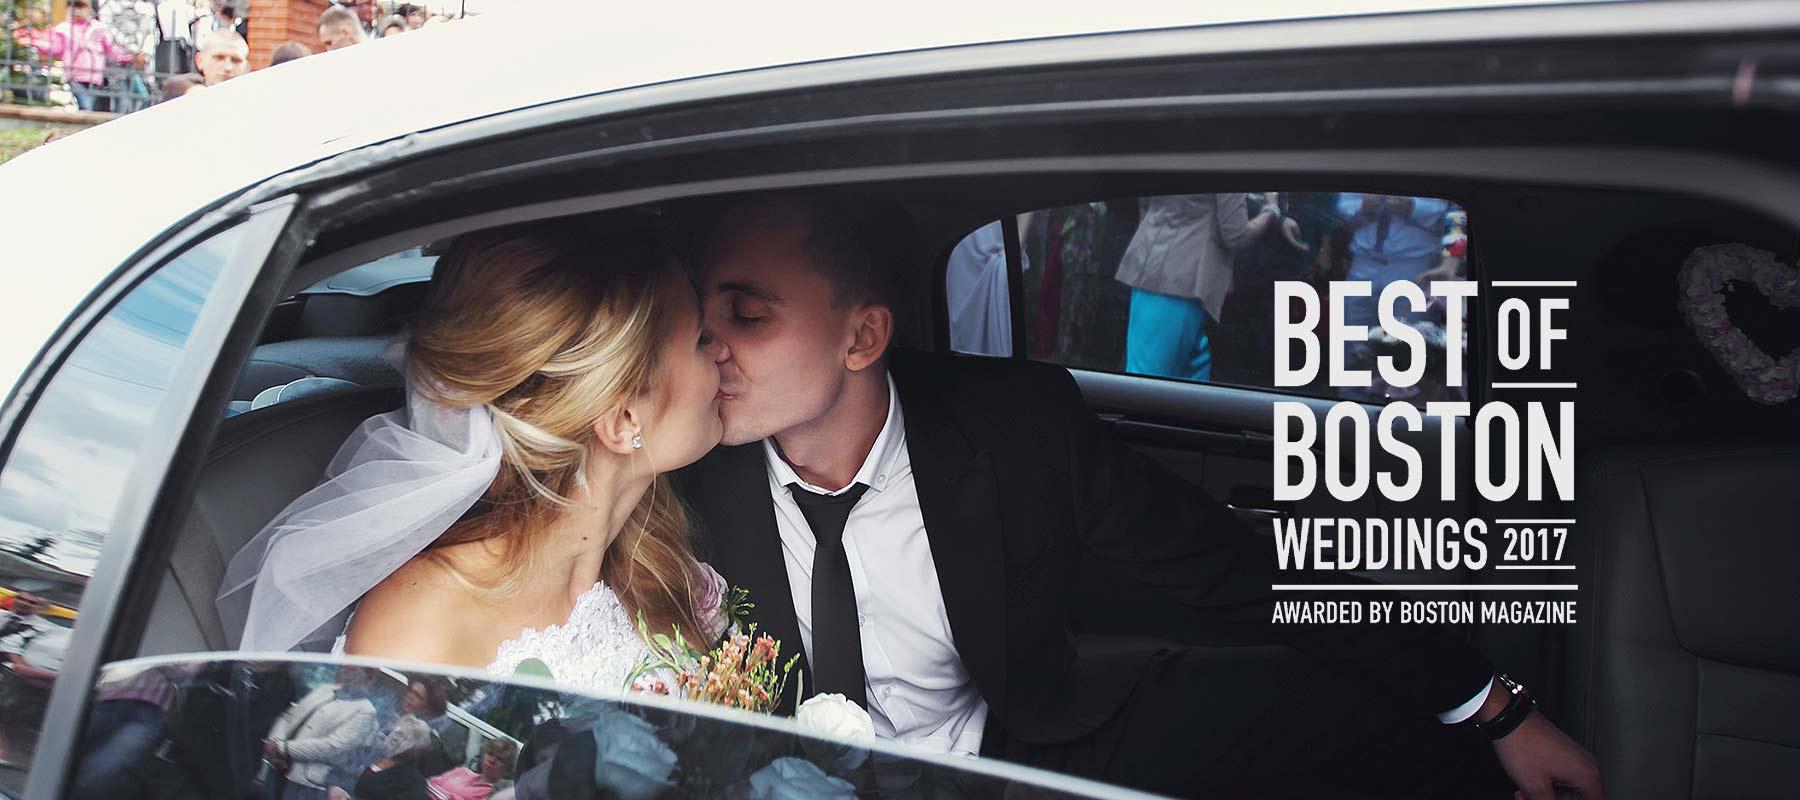 Le Limo Wedding Transportation - Best of Boston